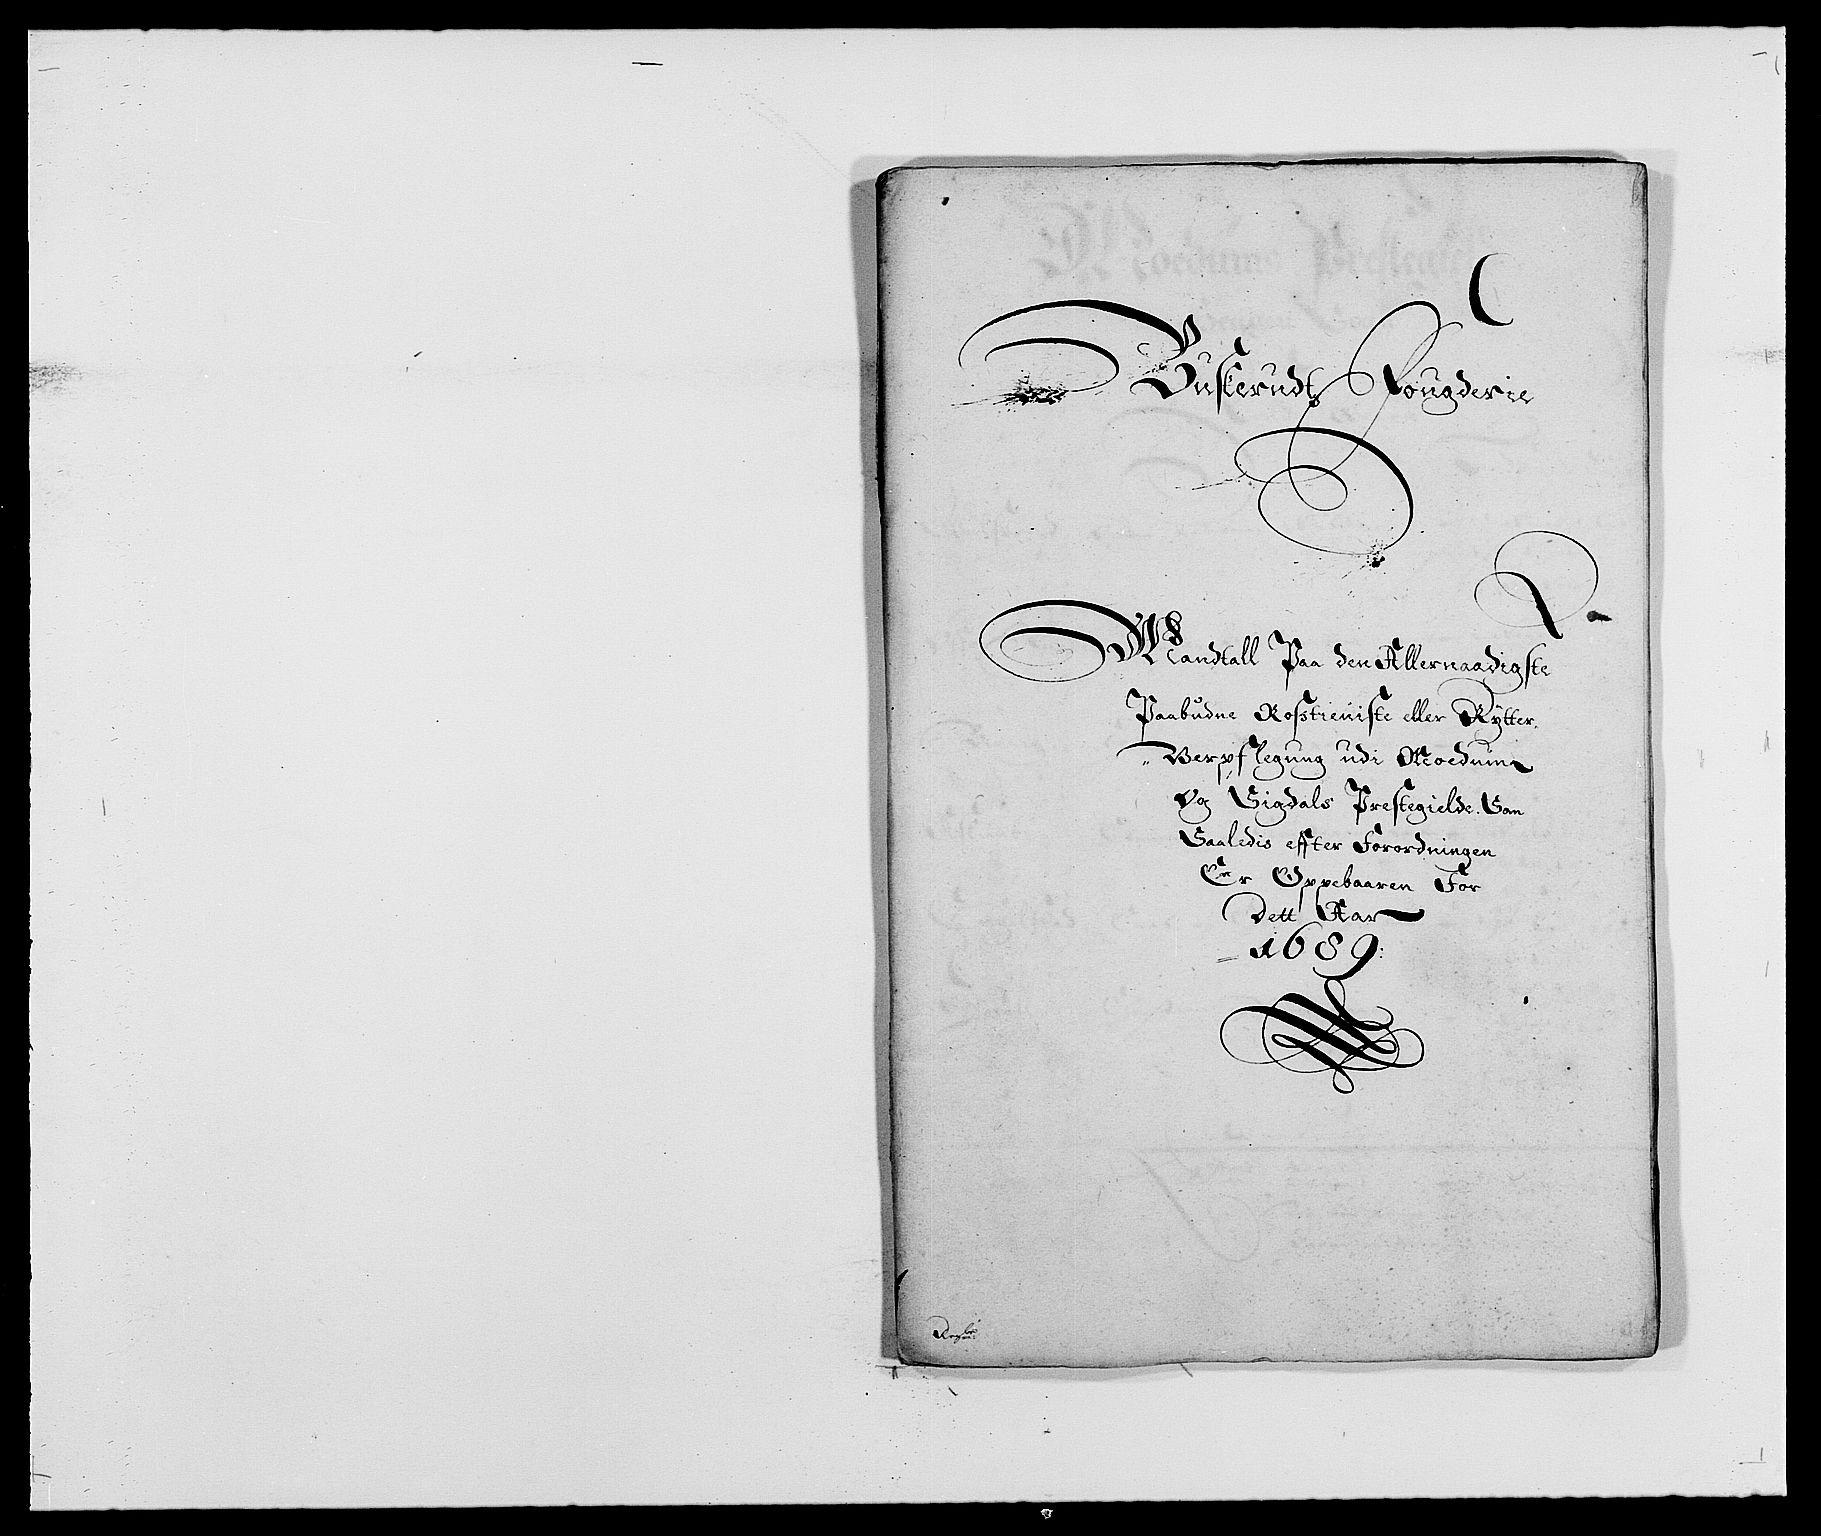 RA, Rentekammeret inntil 1814, Reviderte regnskaper, Fogderegnskap, R25/L1680: Fogderegnskap Buskerud, 1689-1690, s. 172